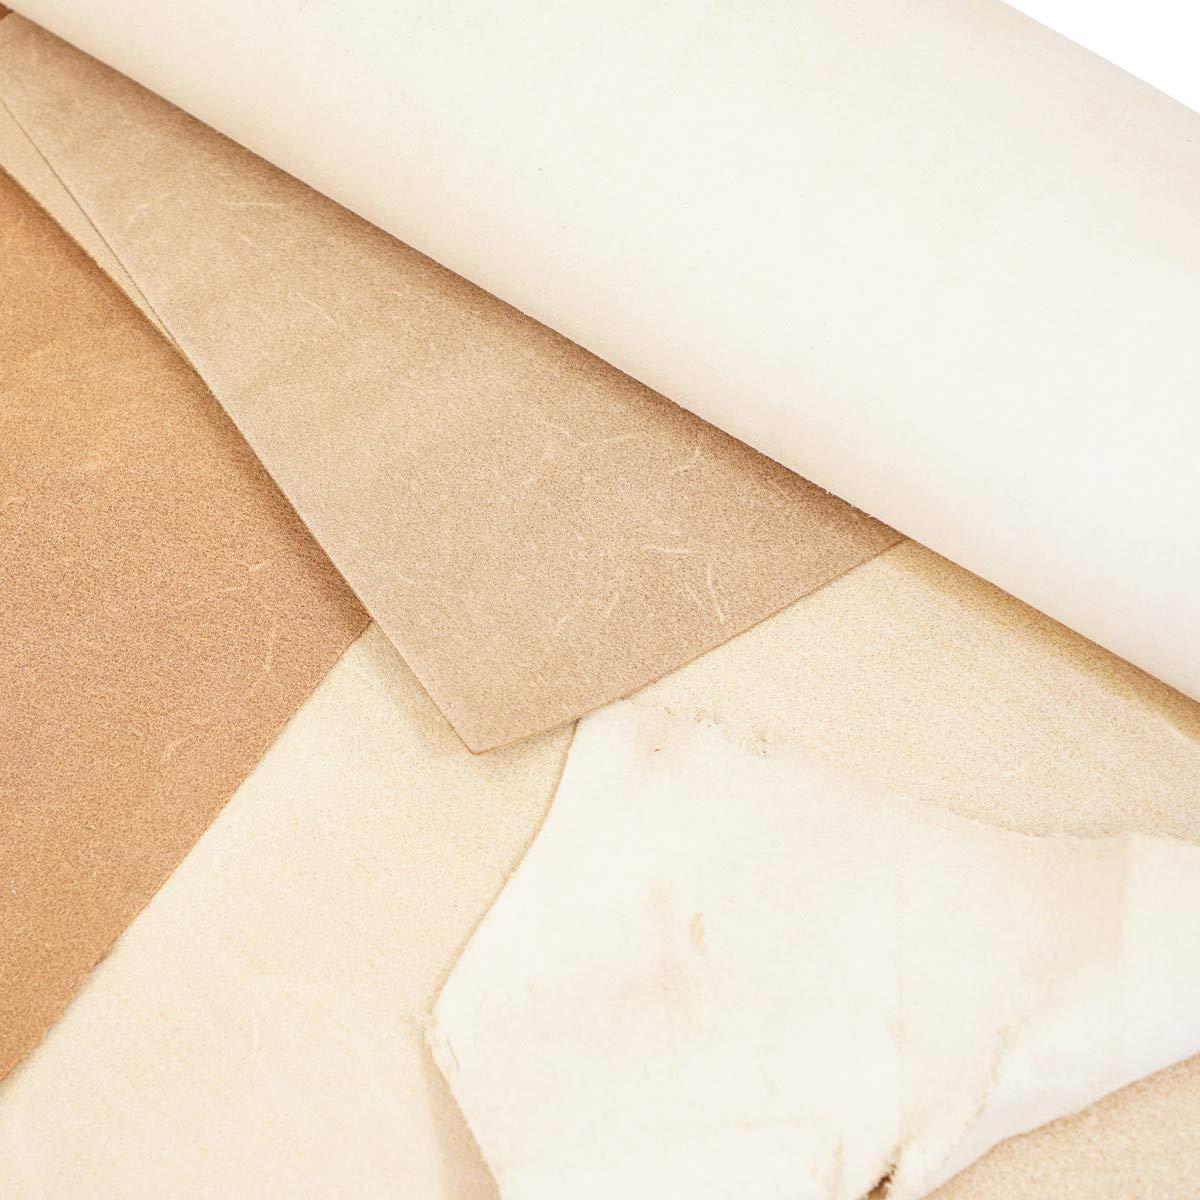 Springfield Leather Company Veg Tan Leather Bundle